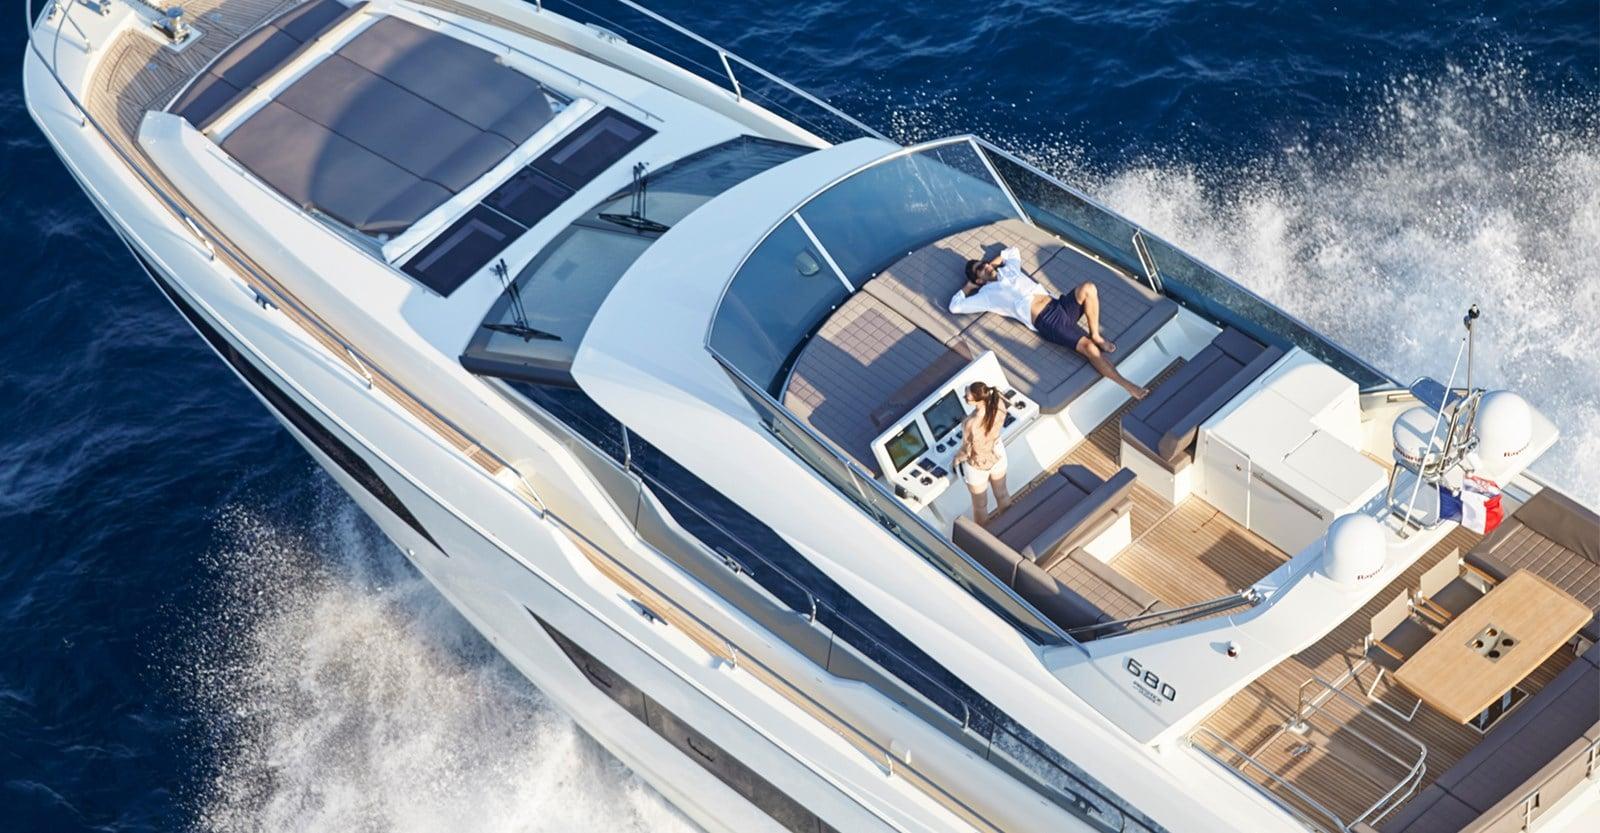 new prestige 680 yacht over head view